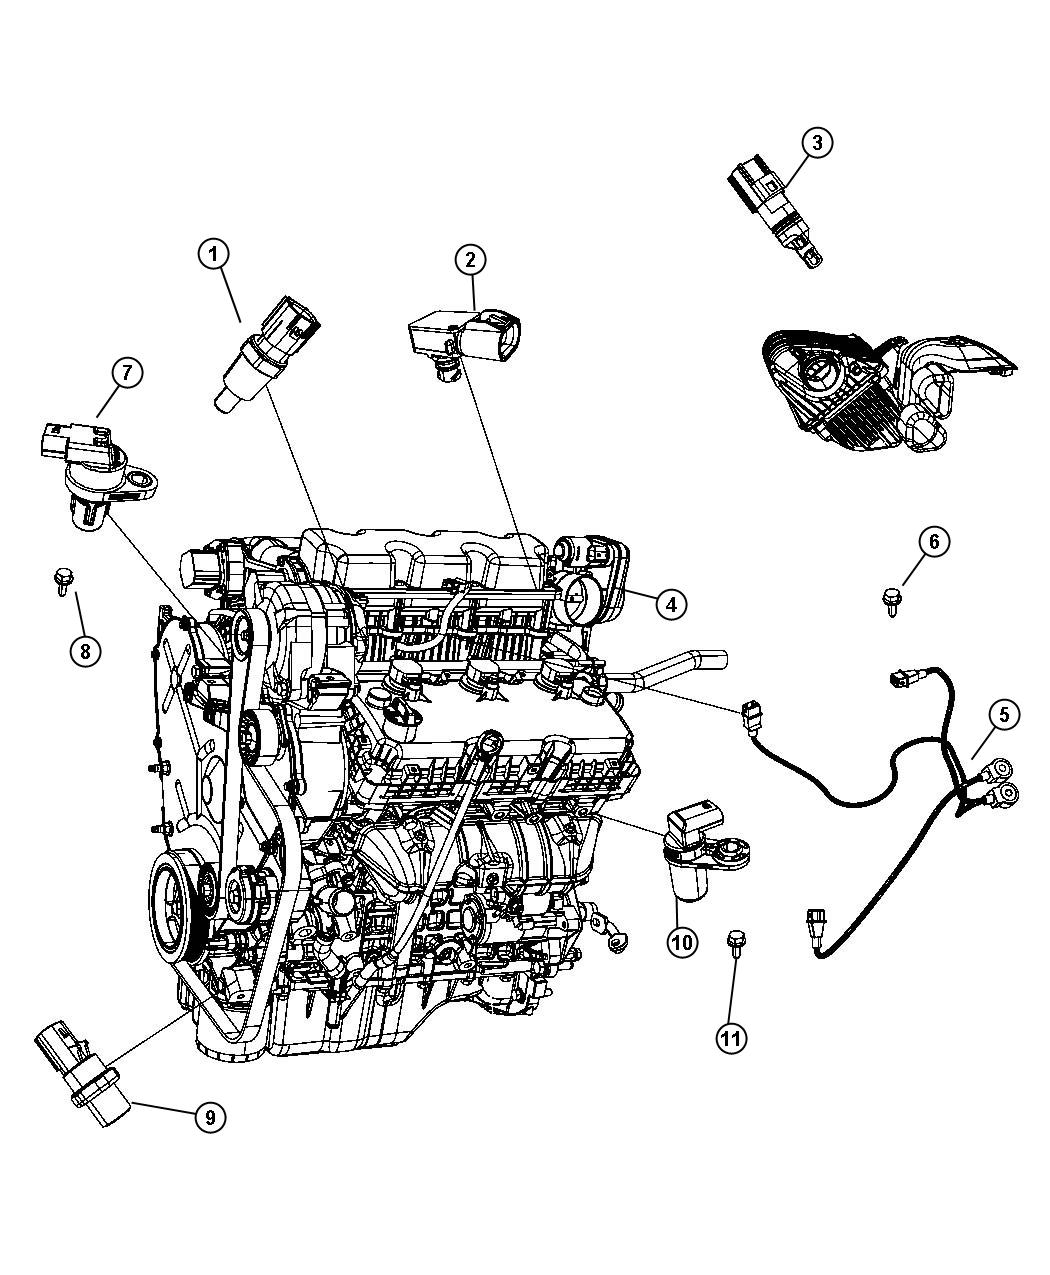 hight resolution of wiper wiring diagram besides 2008 dodge avenger belt